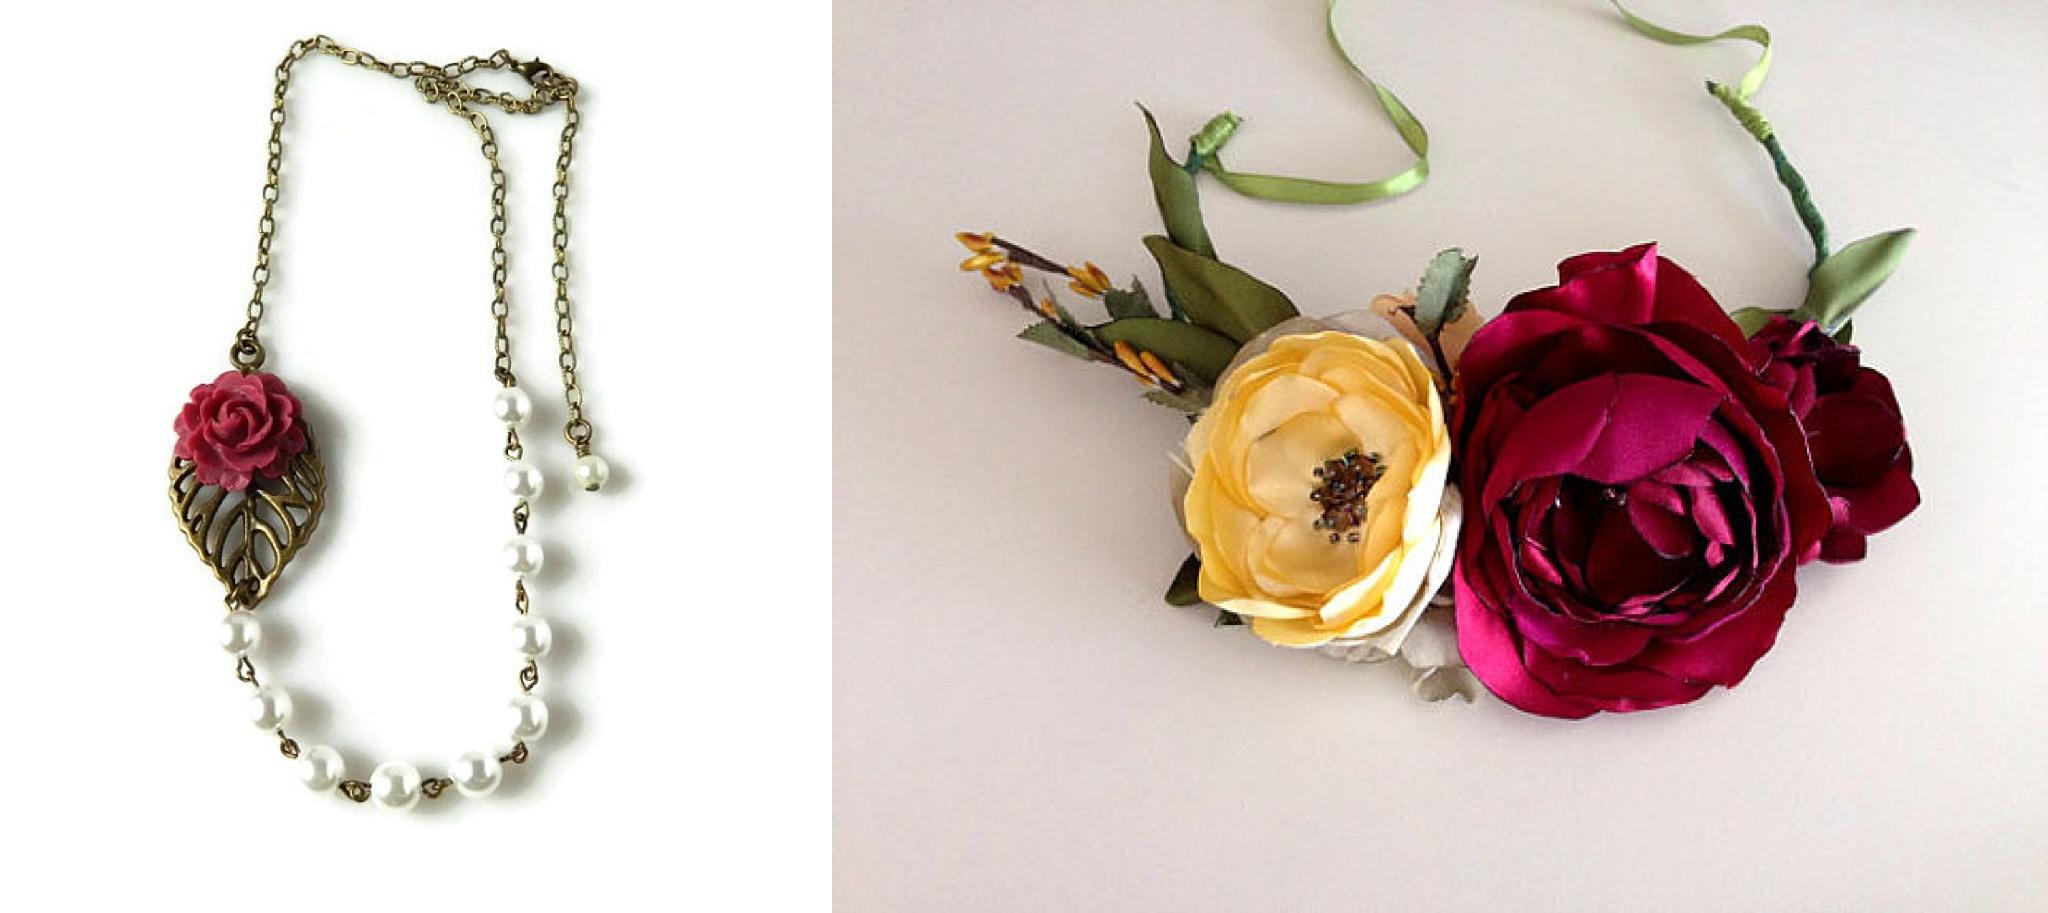 SOURCES:  Necklace /  Flower crown